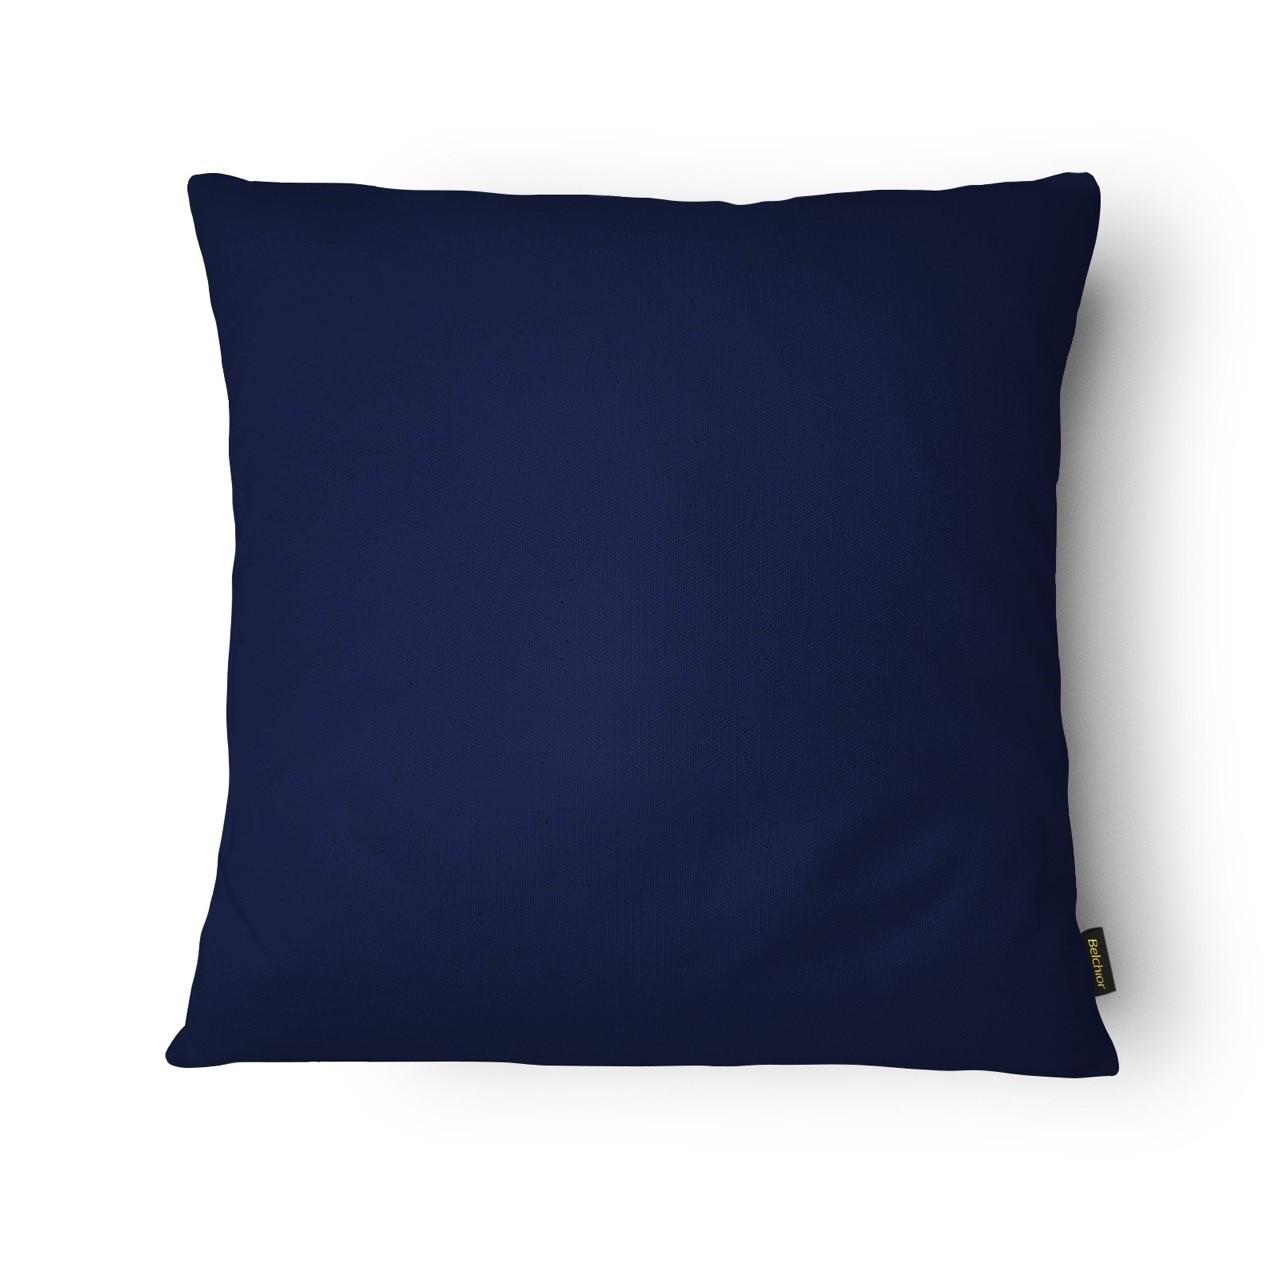 Capa de Almofada Colors 43x43 cm Azul Marinho 367037 - Belchior